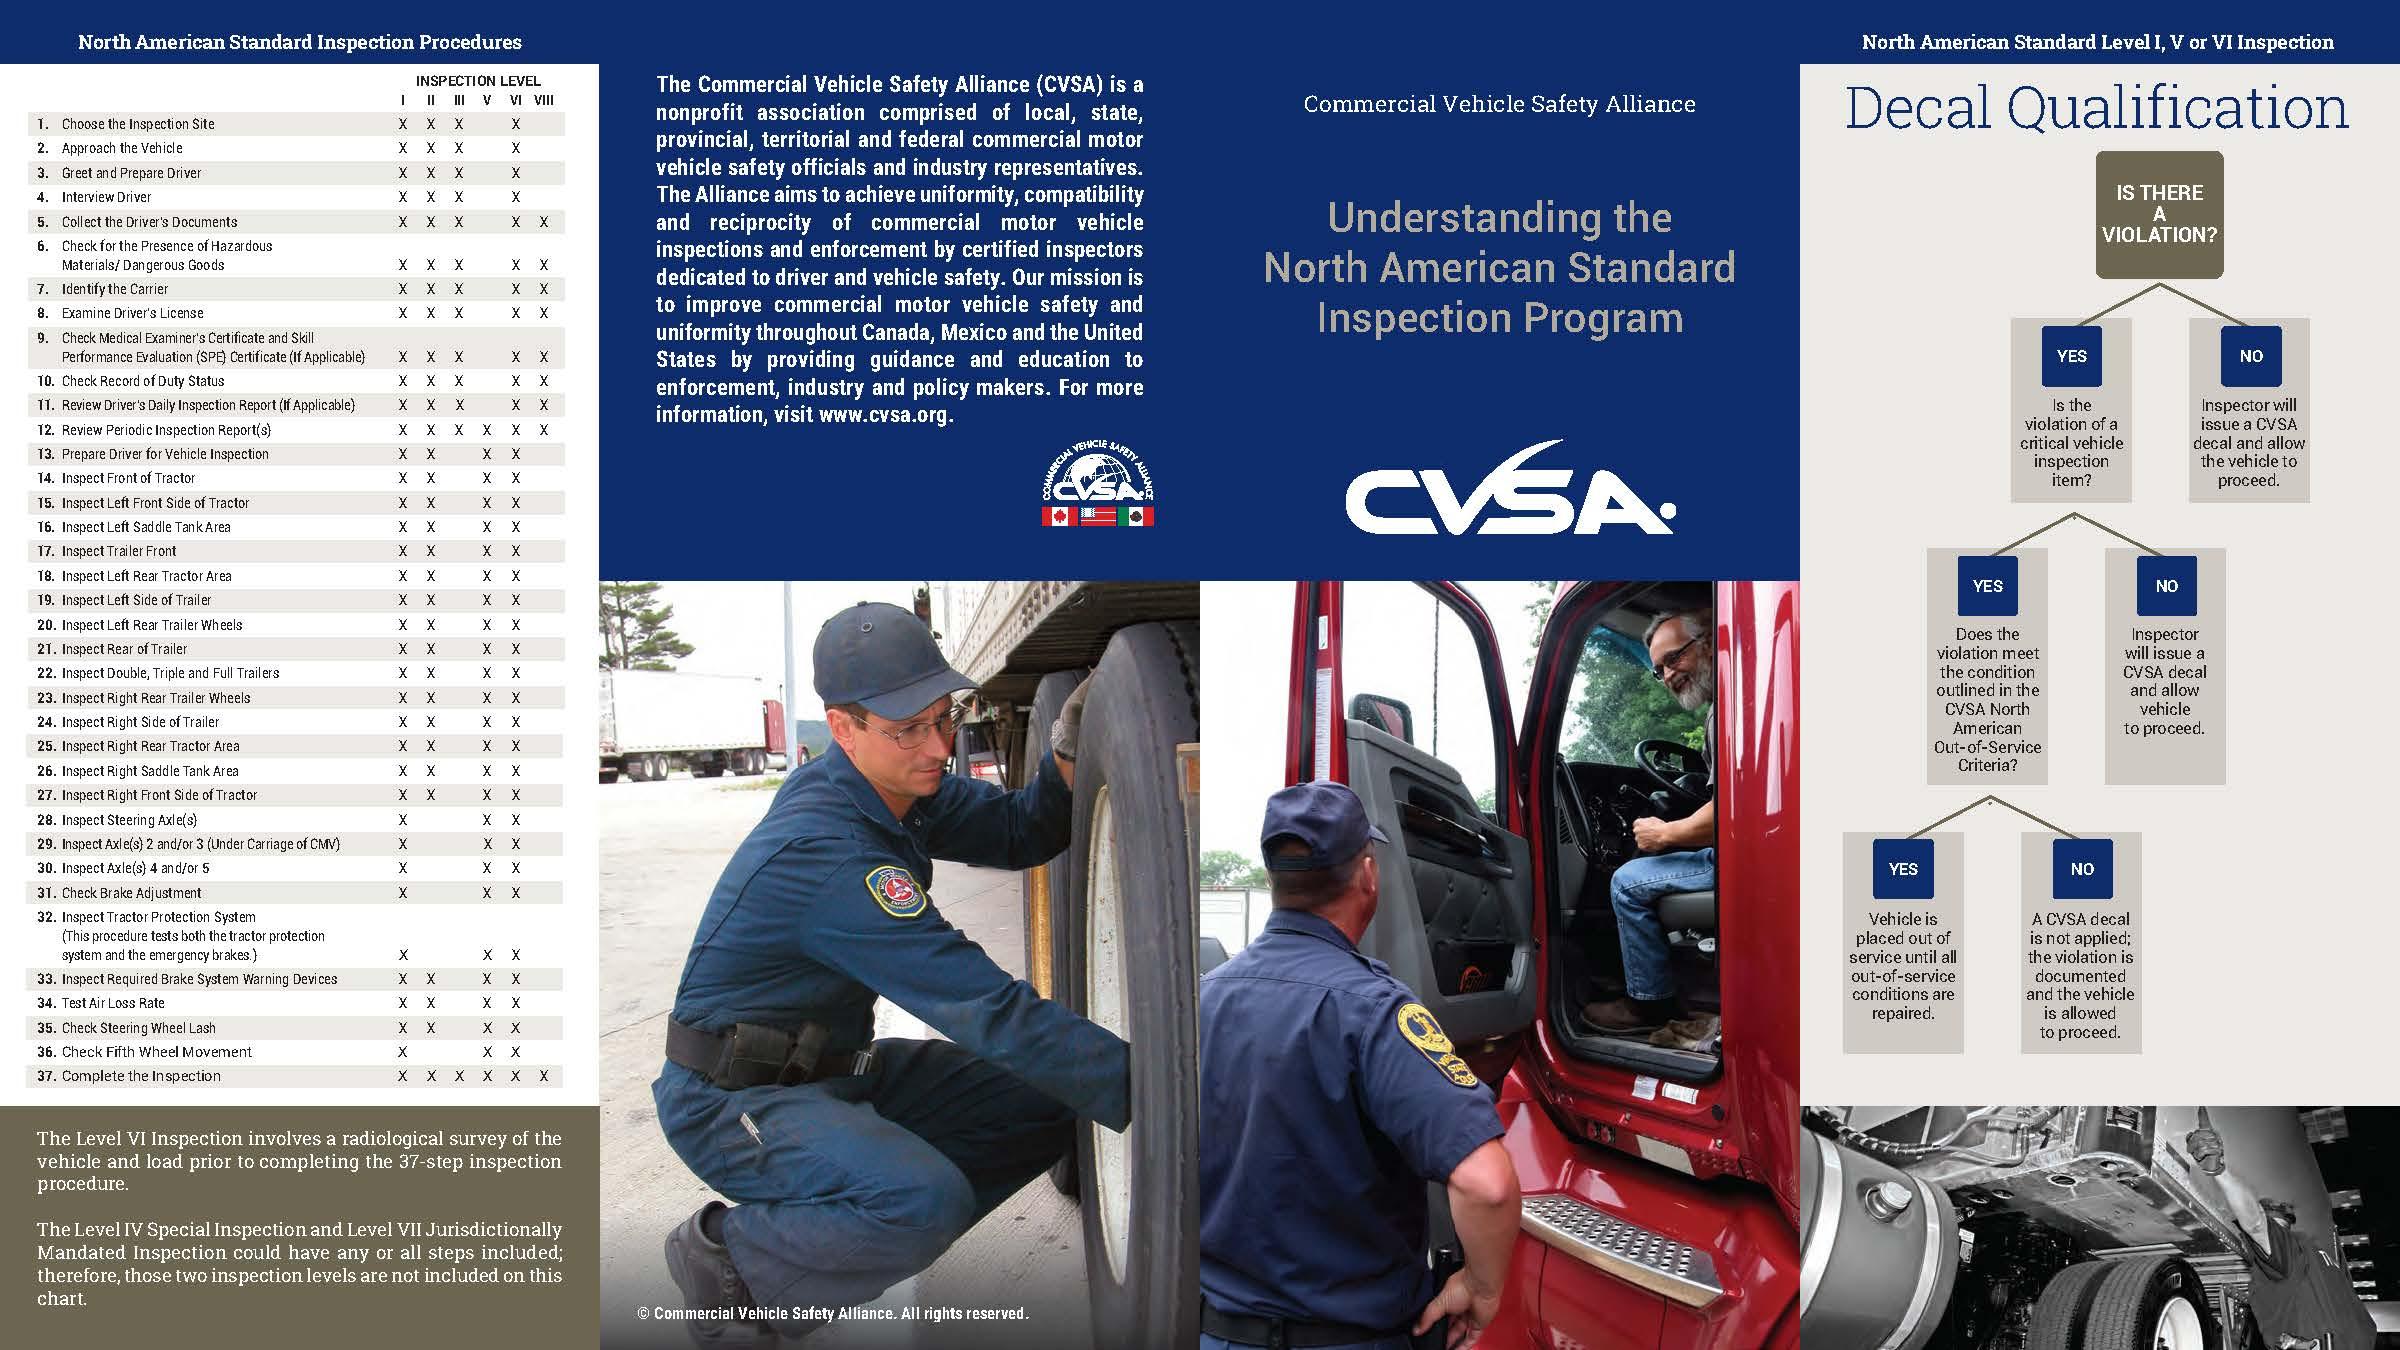 2018 North America Standard Inspection-Program-Brochure